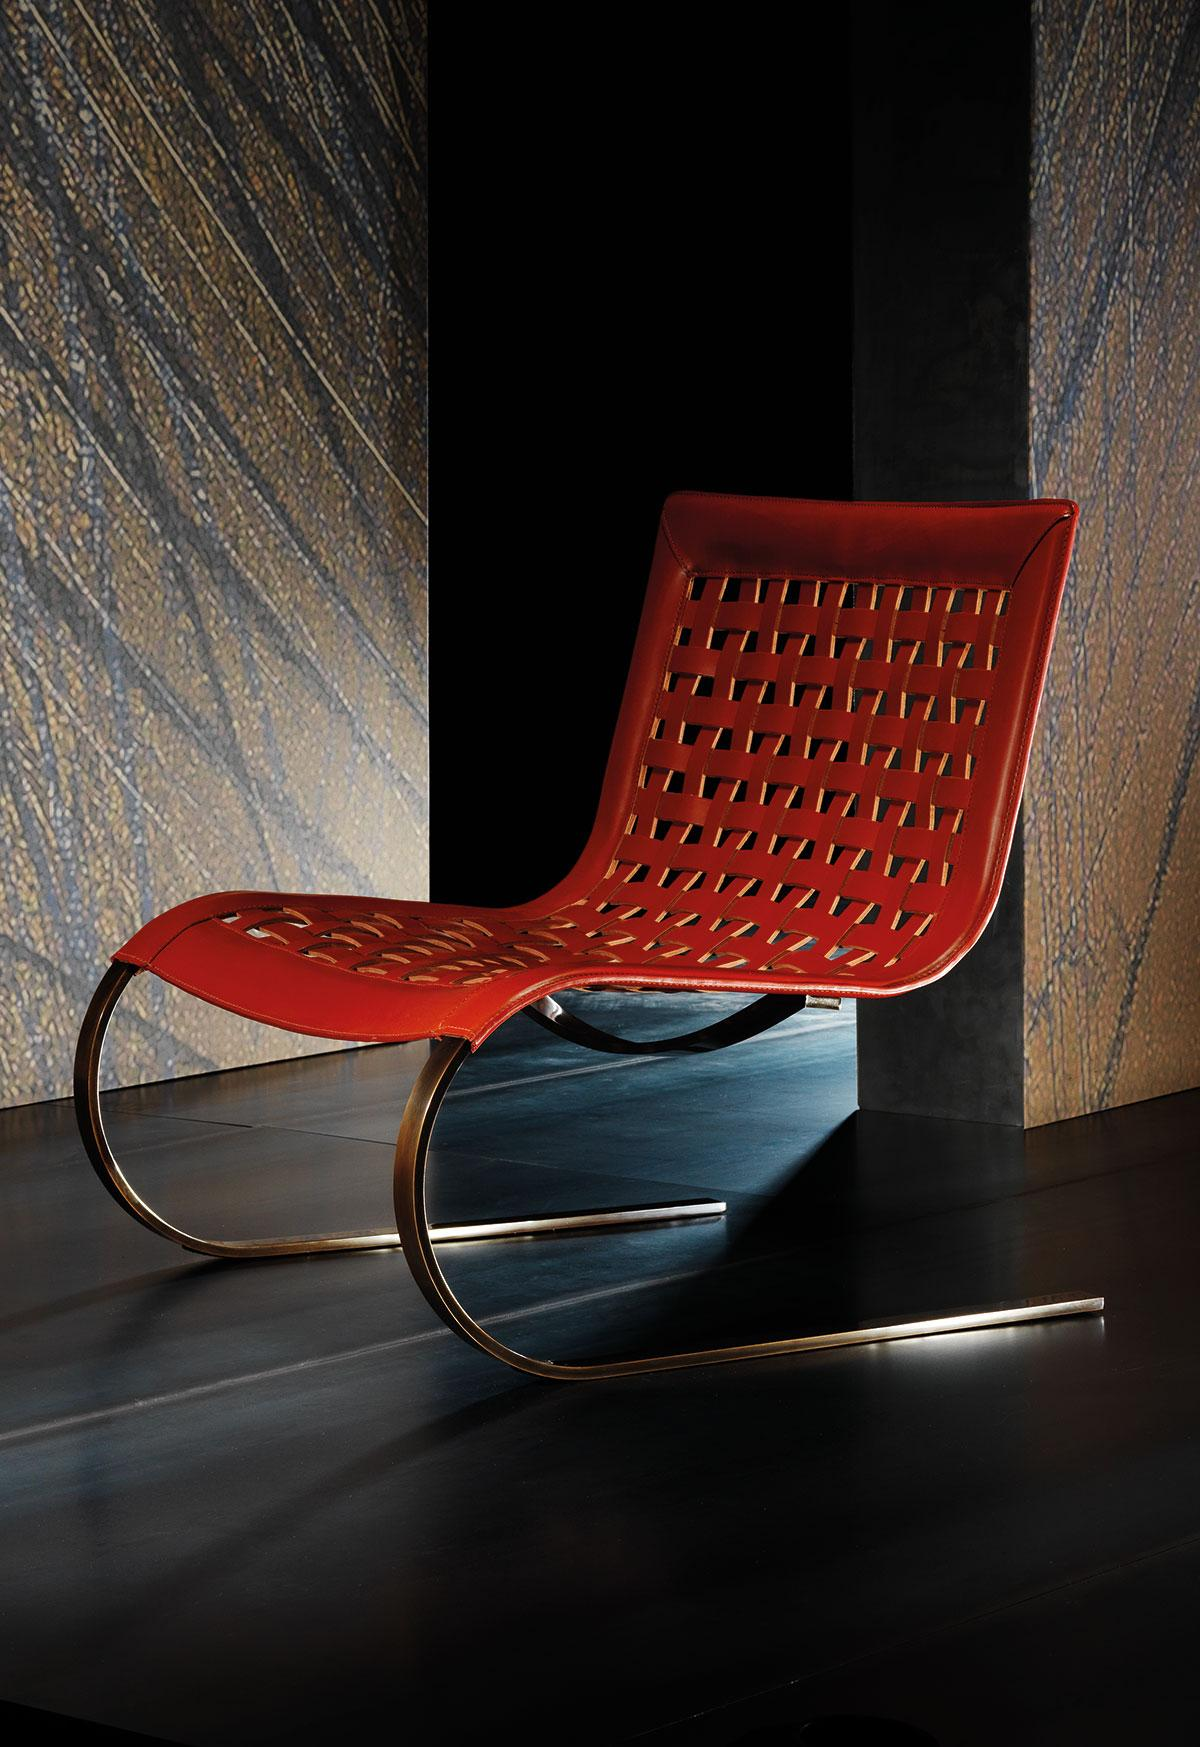 O 39 mies poltrona lounge italy dream design for Poltrona mies